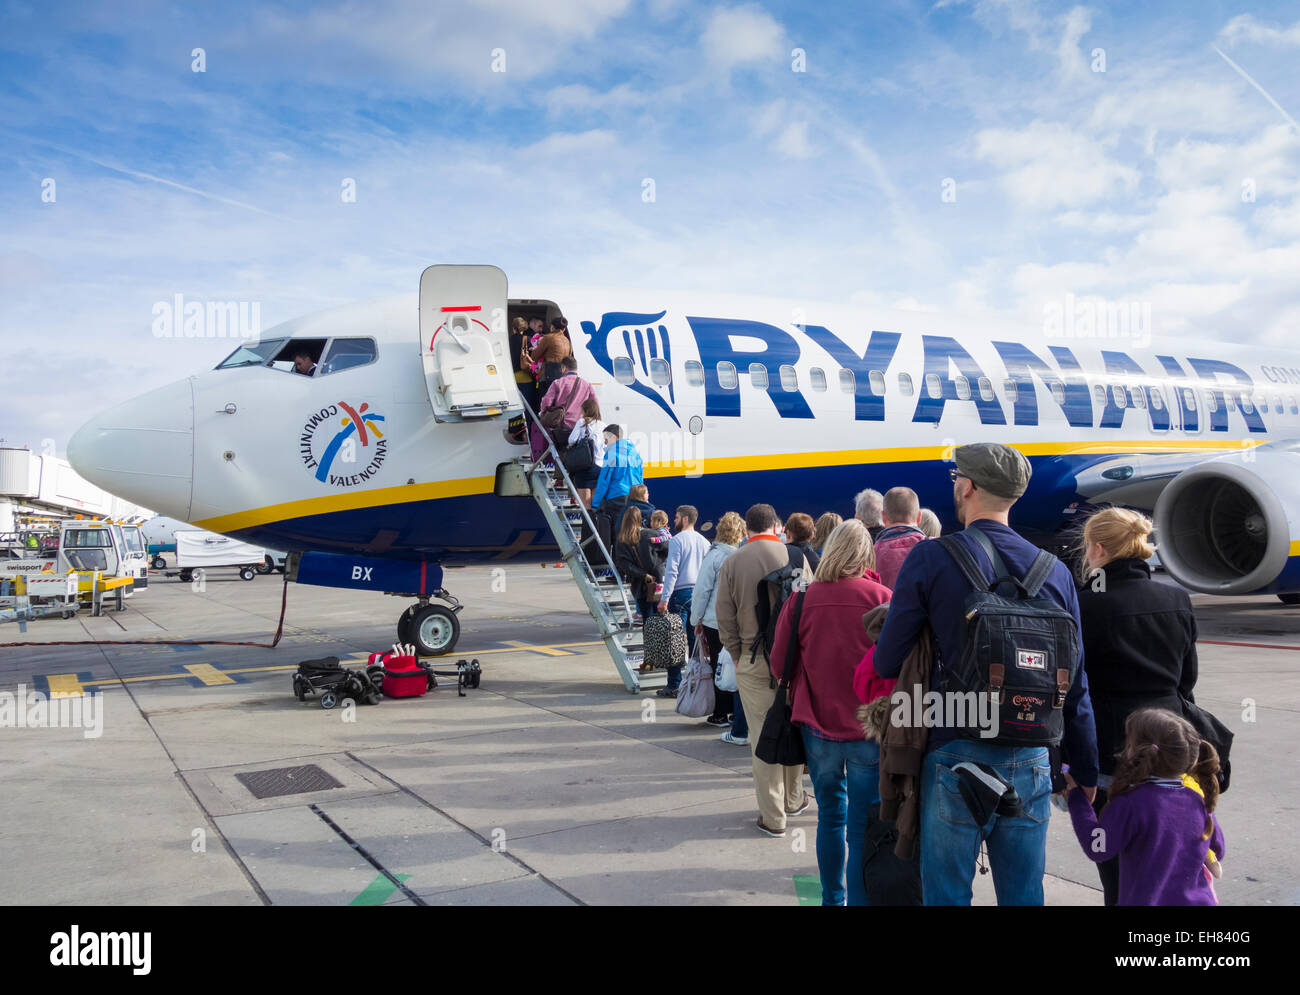 Passengers boarding Ryanair plane at Manchester Airport. England. UK - Stock Image